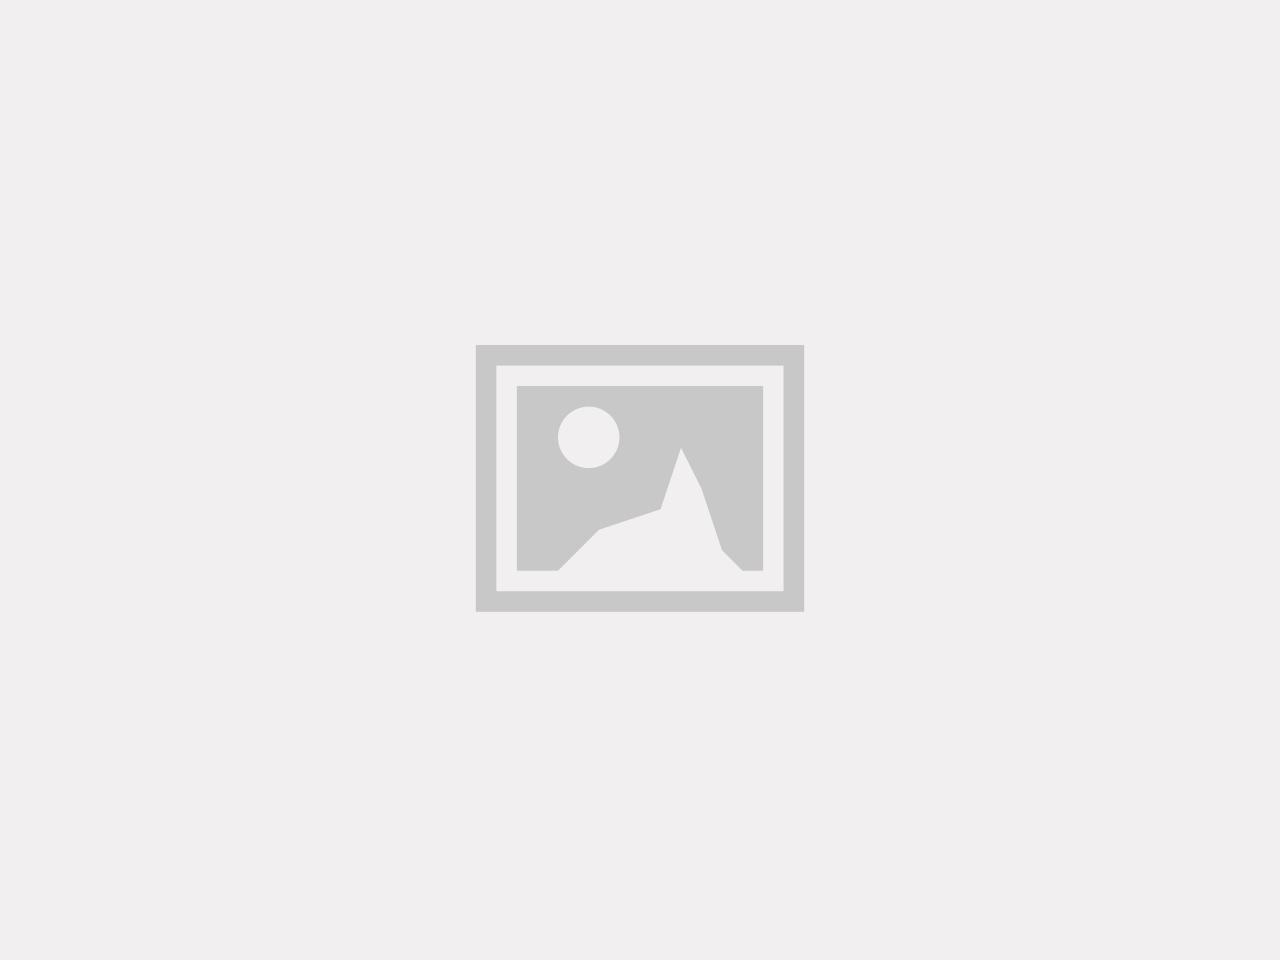 Snörledare Brun (M02)